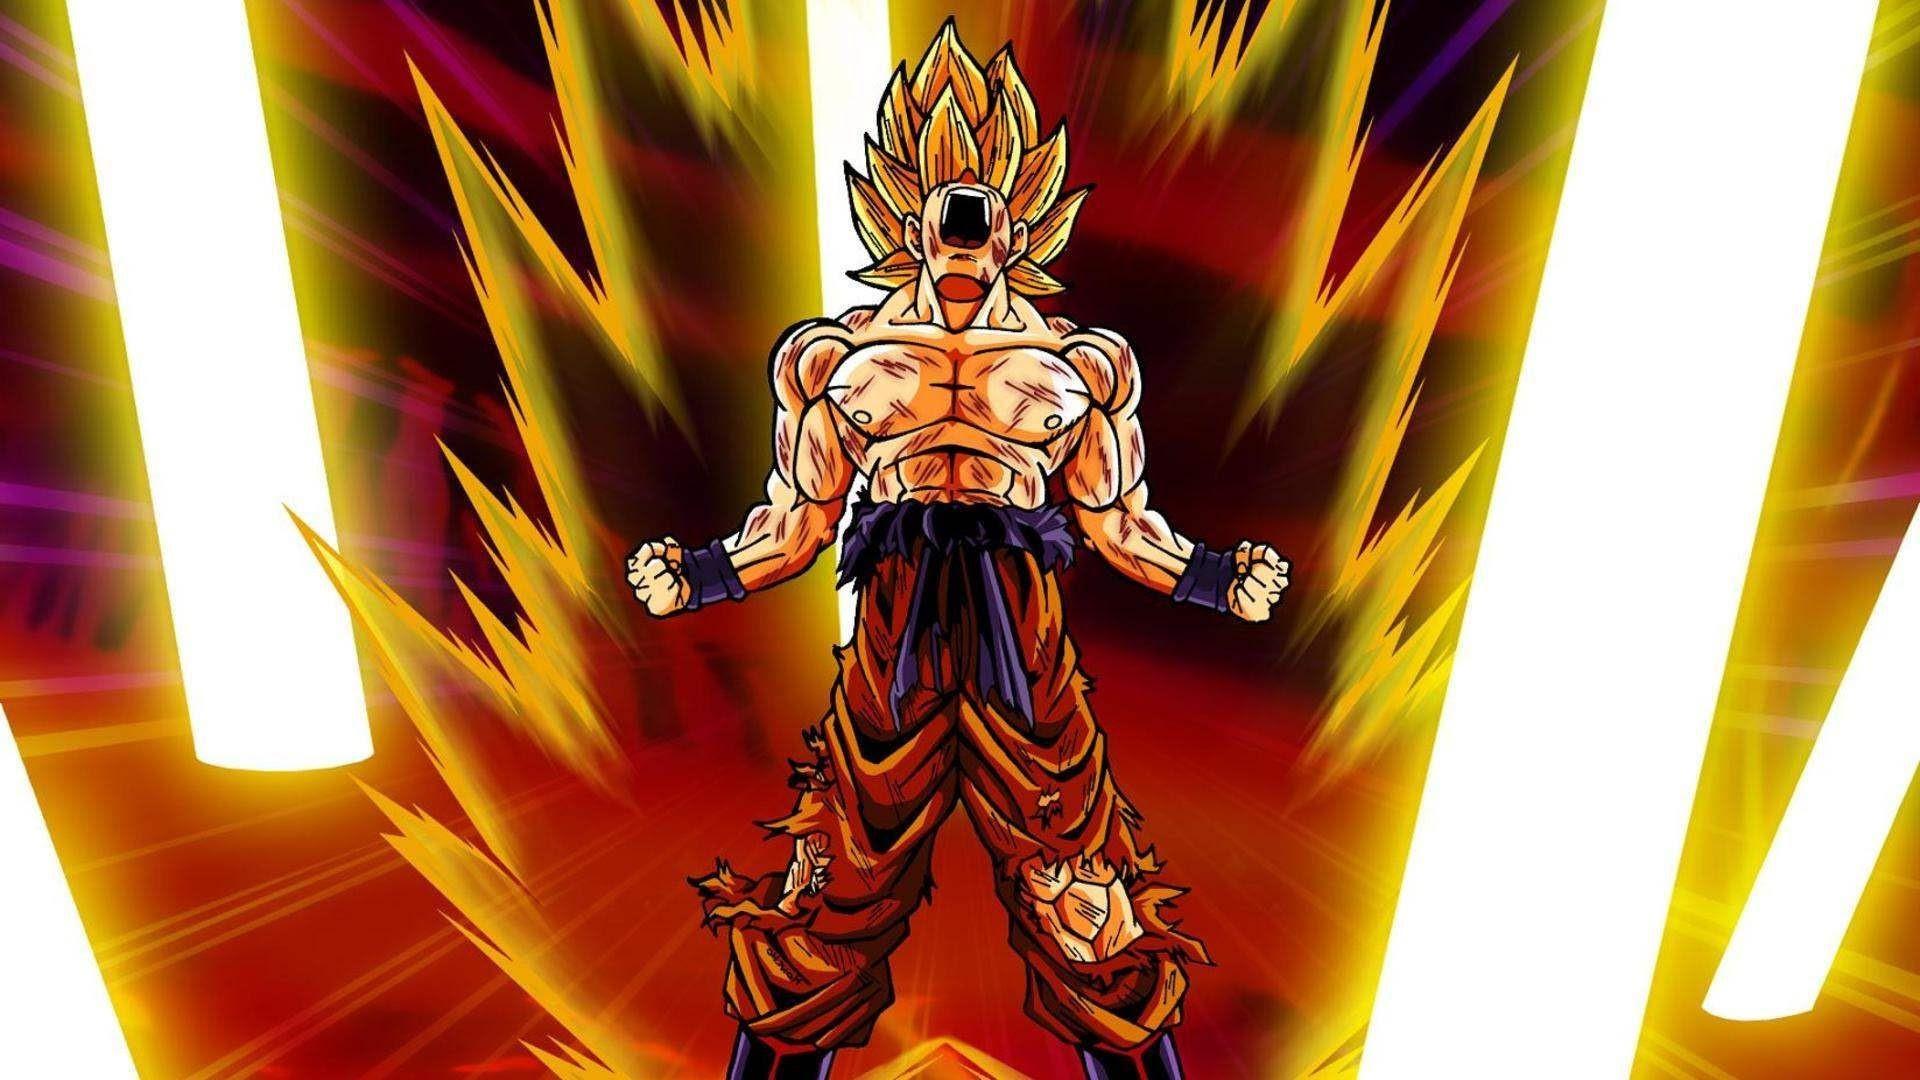 Goku Super Saiyan Wallpaper 72 Images